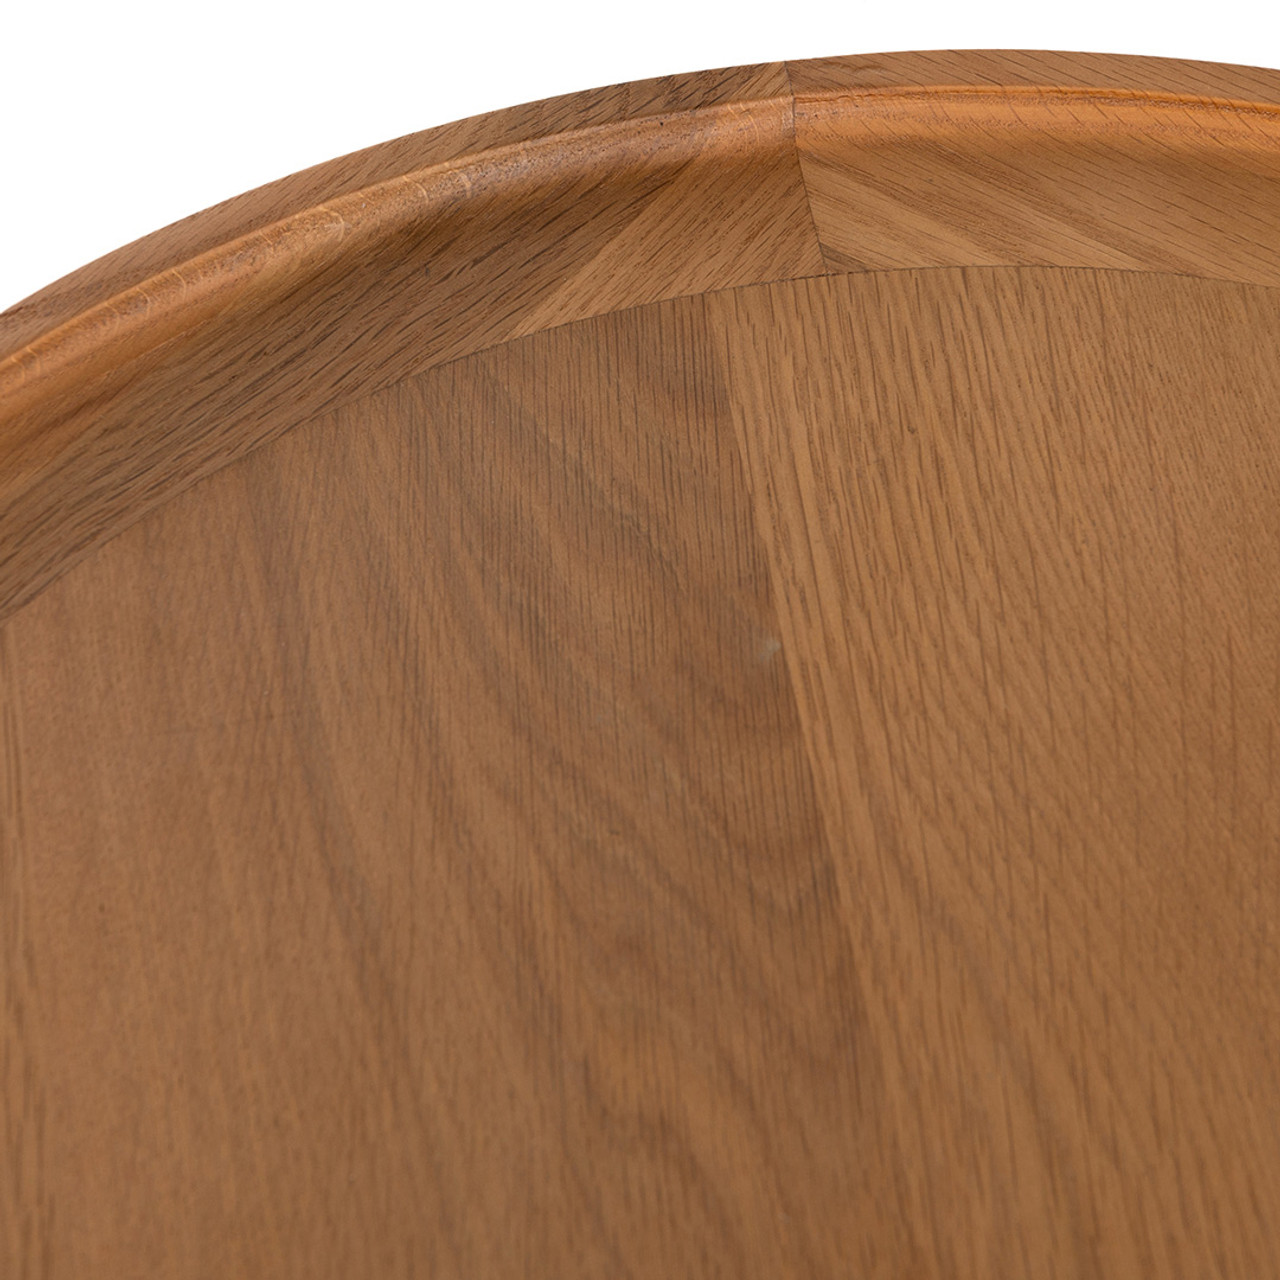 Saint Kitts End Table - Golden Wheat Oak